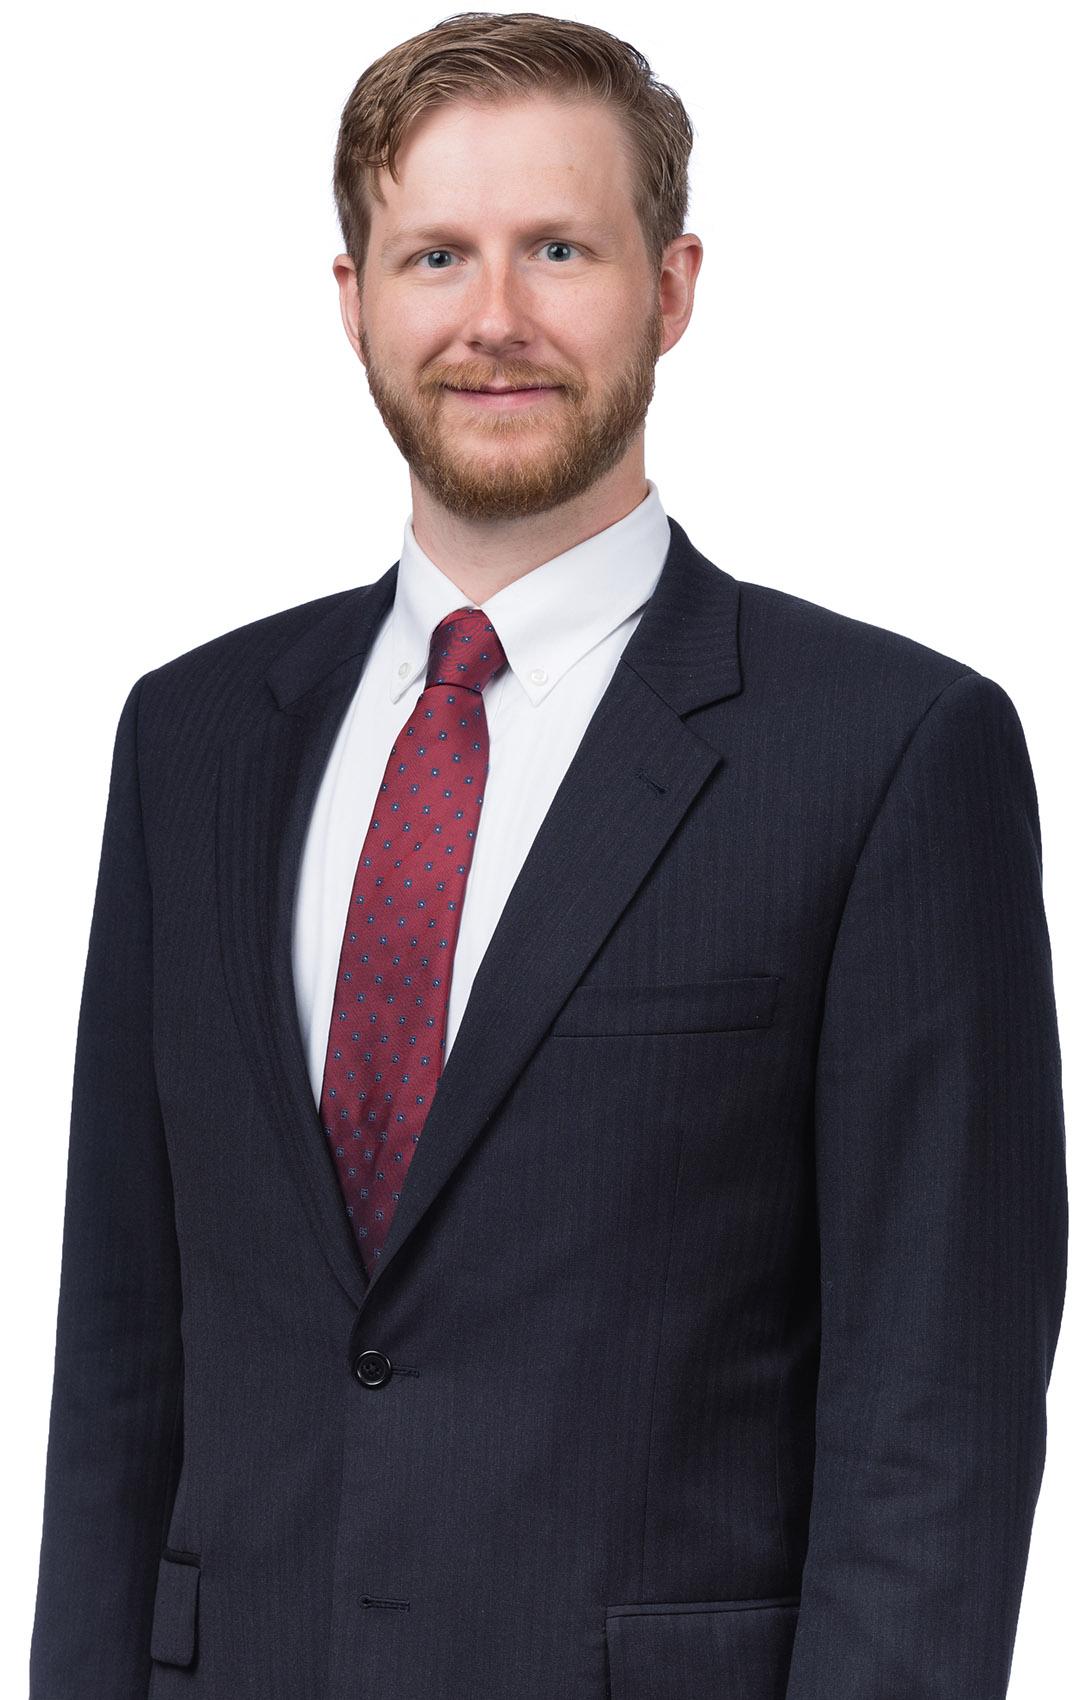 Alex C. Frampton